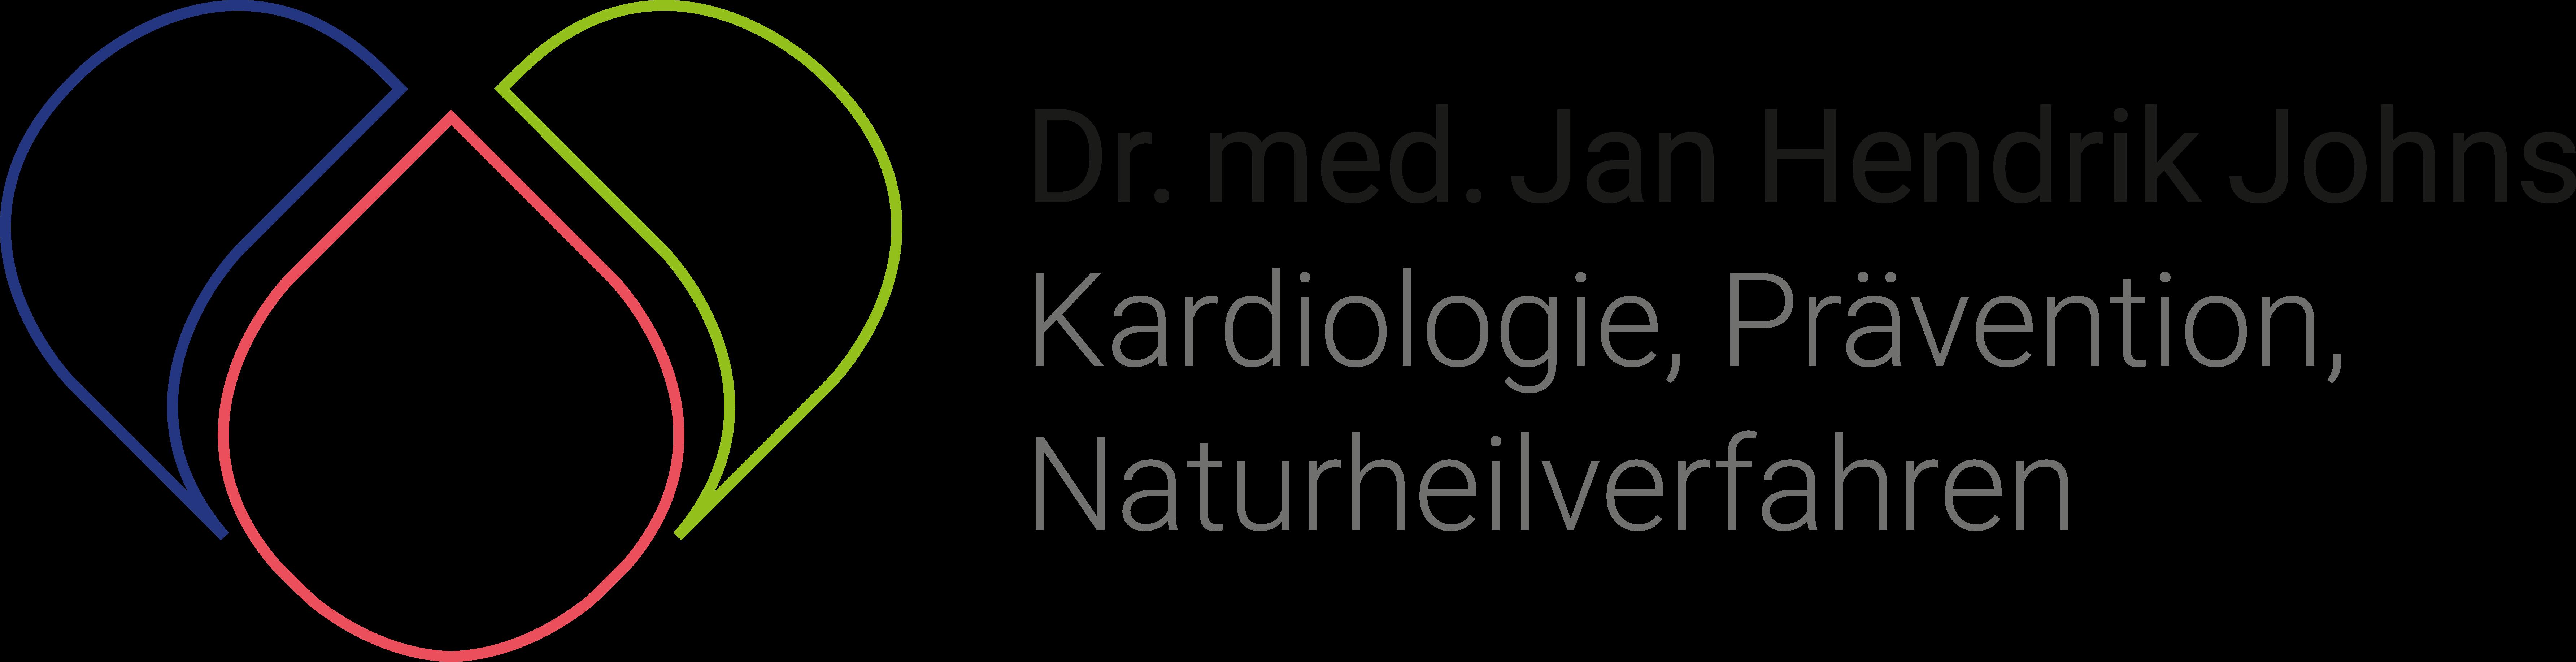 johns logo